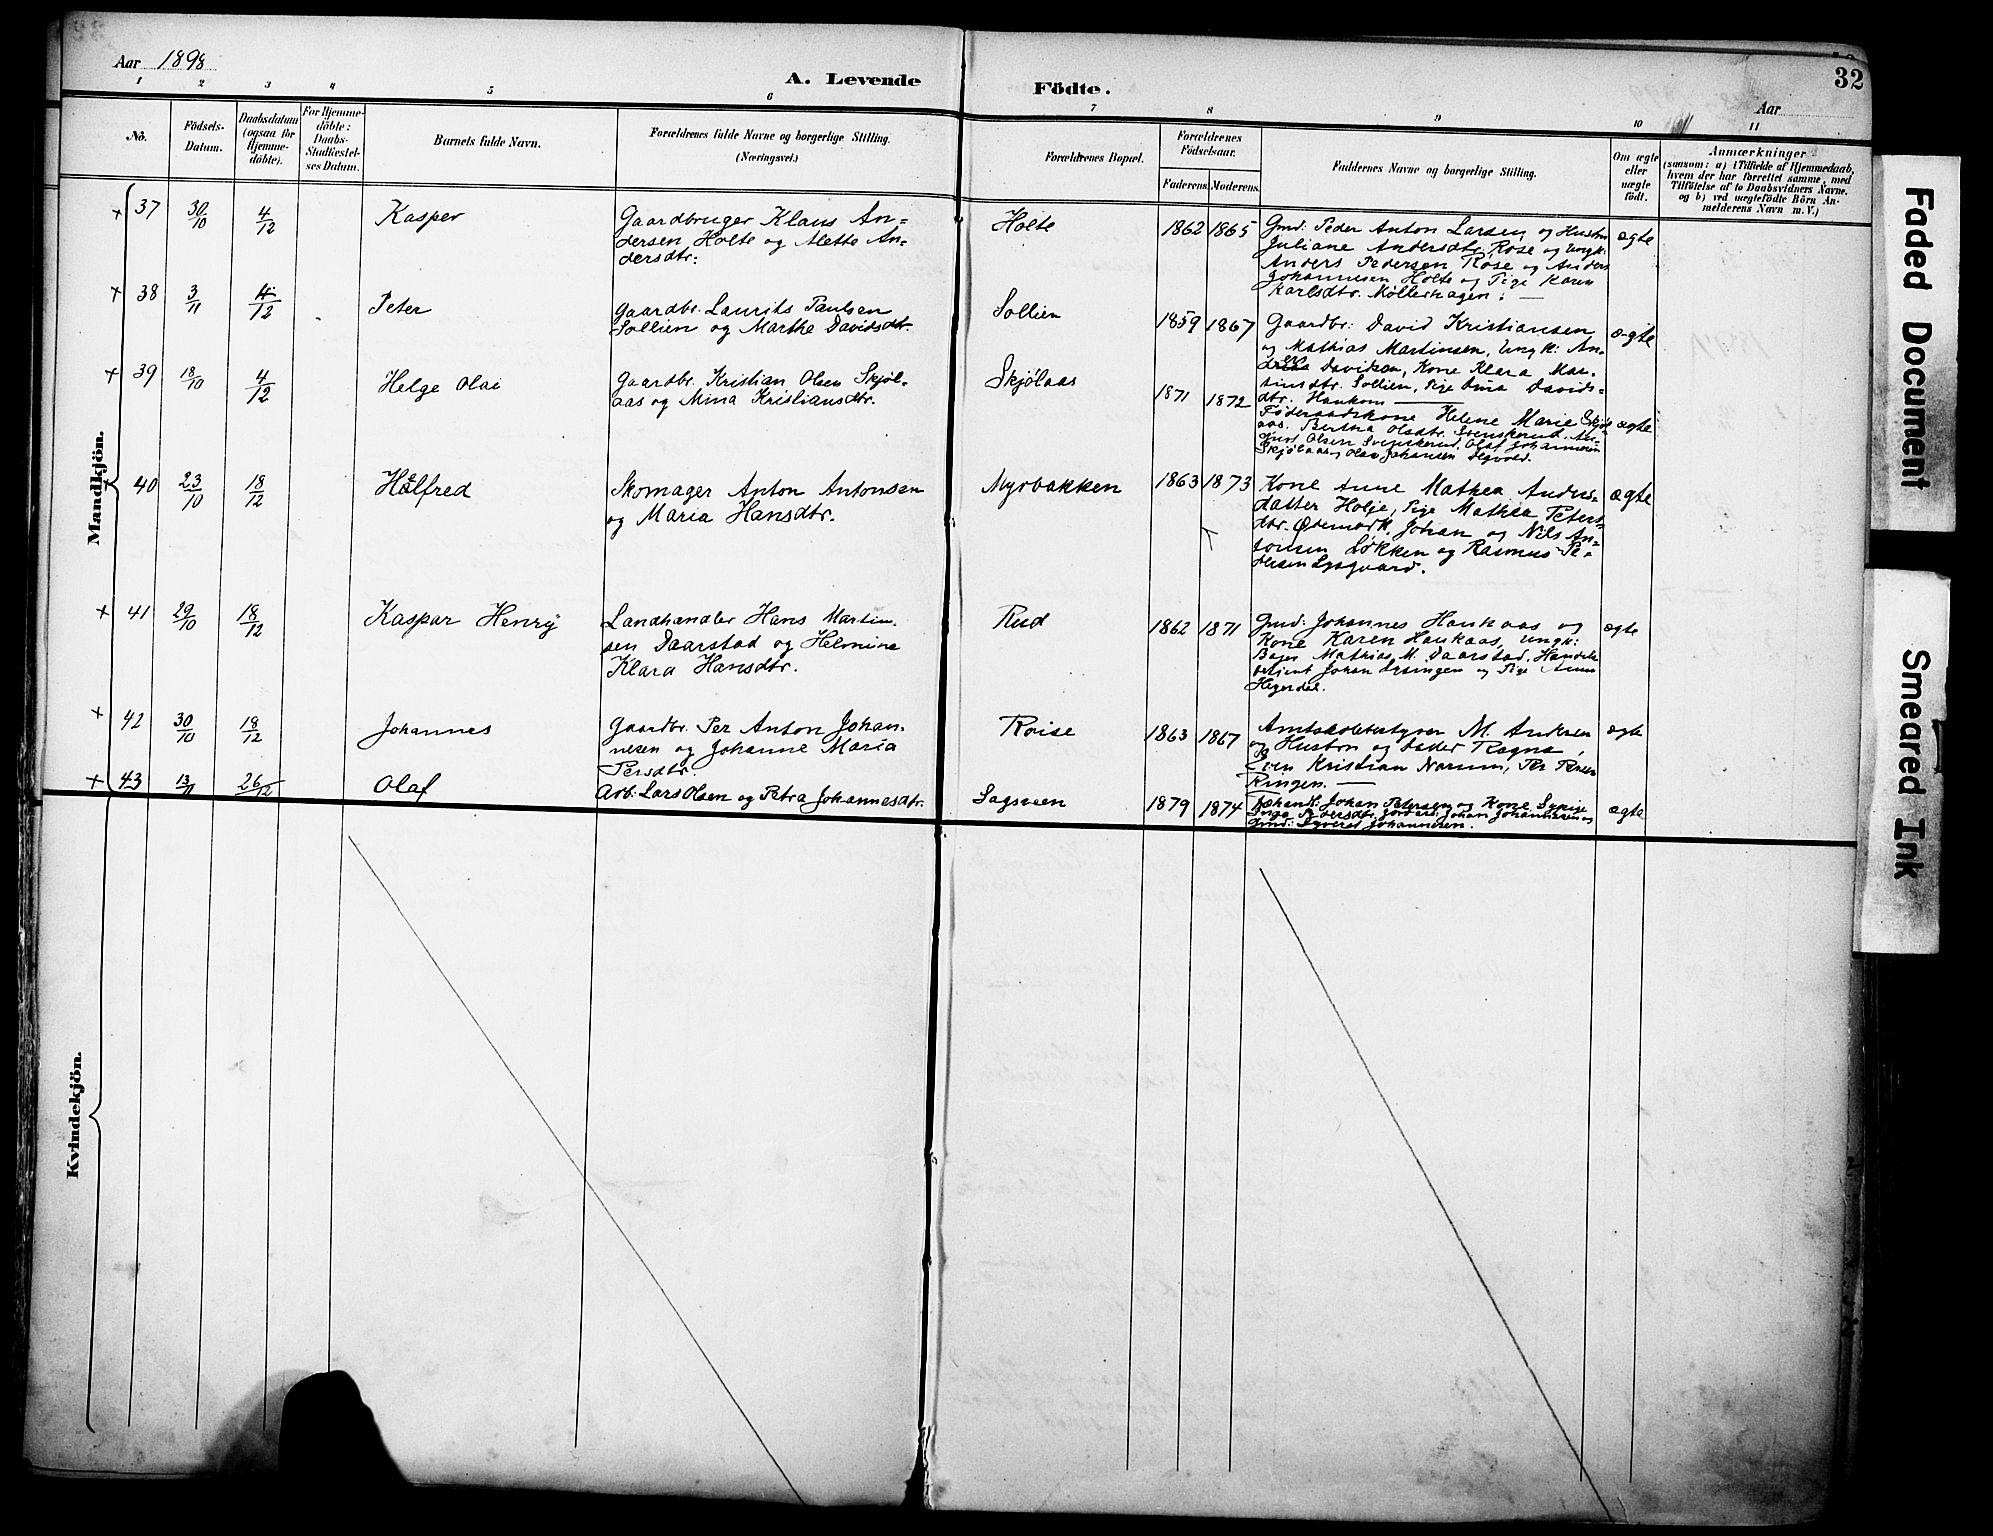 SAH, Vestre Toten prestekontor, H/Ha/Haa/L0013: Ministerialbok nr. 13, 1895-1911, s. 32